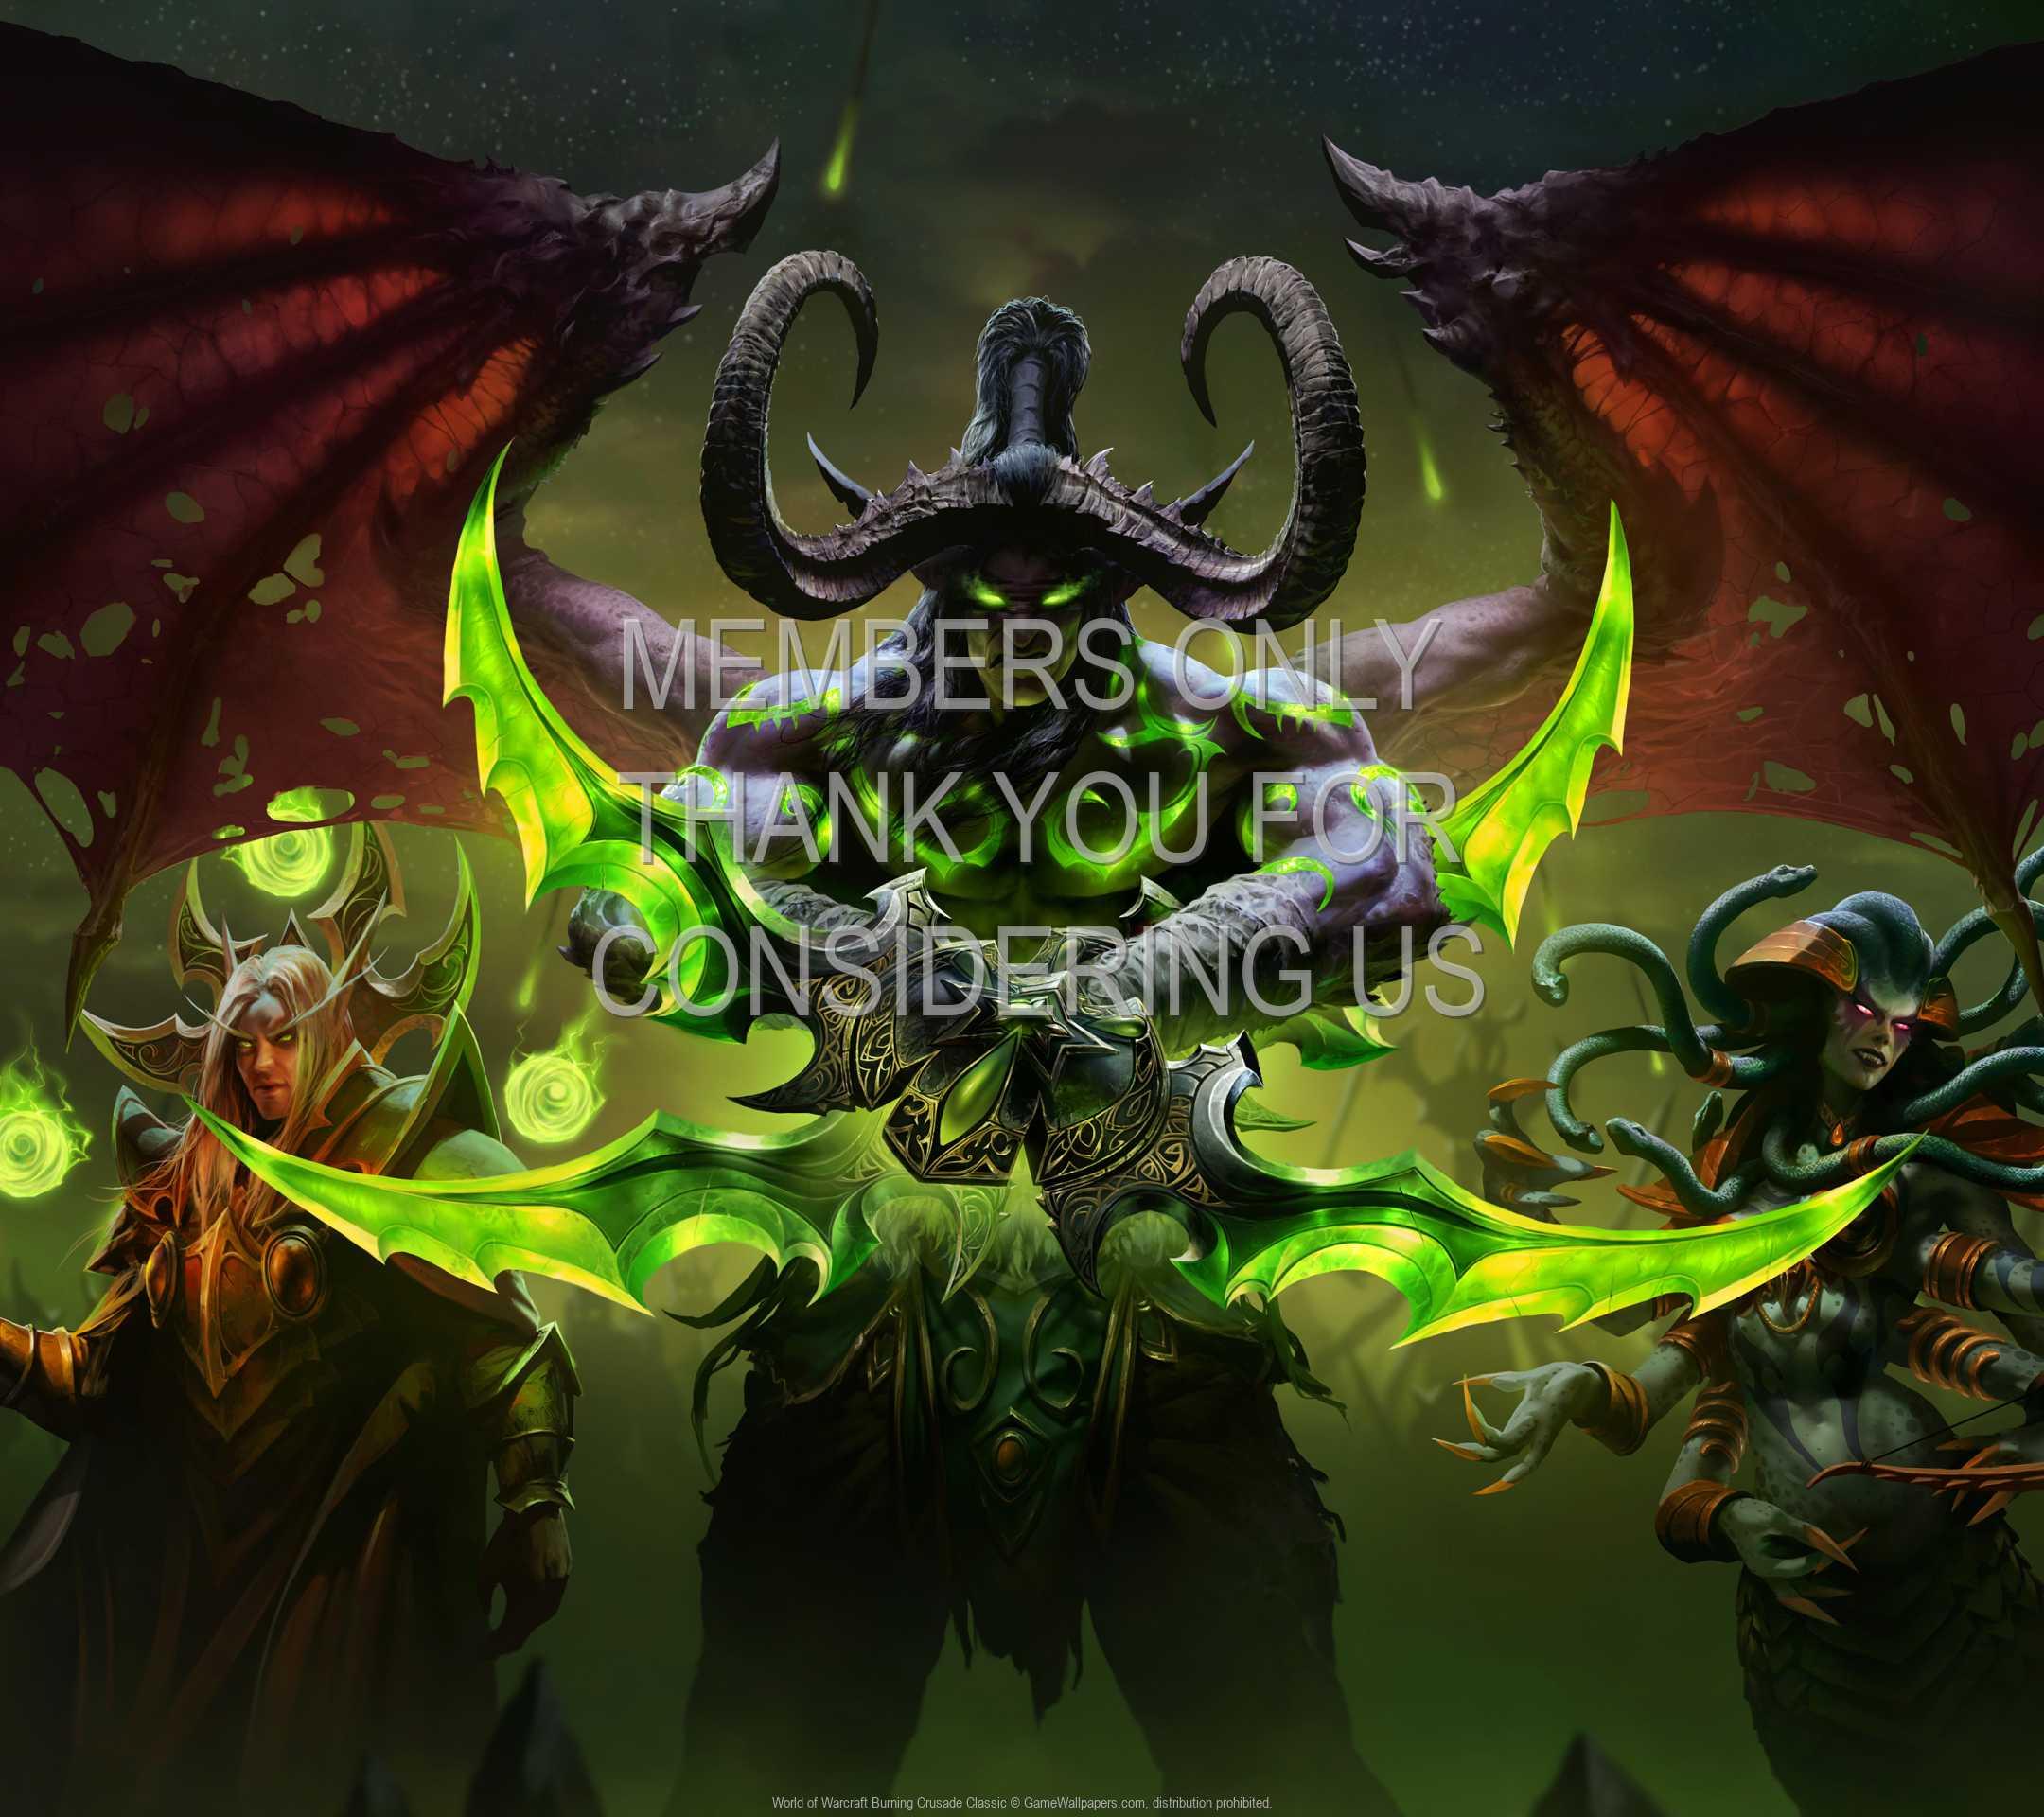 World of Warcraft: Burning Crusade Classic 1080p Horizontal Mobile wallpaper or background 01